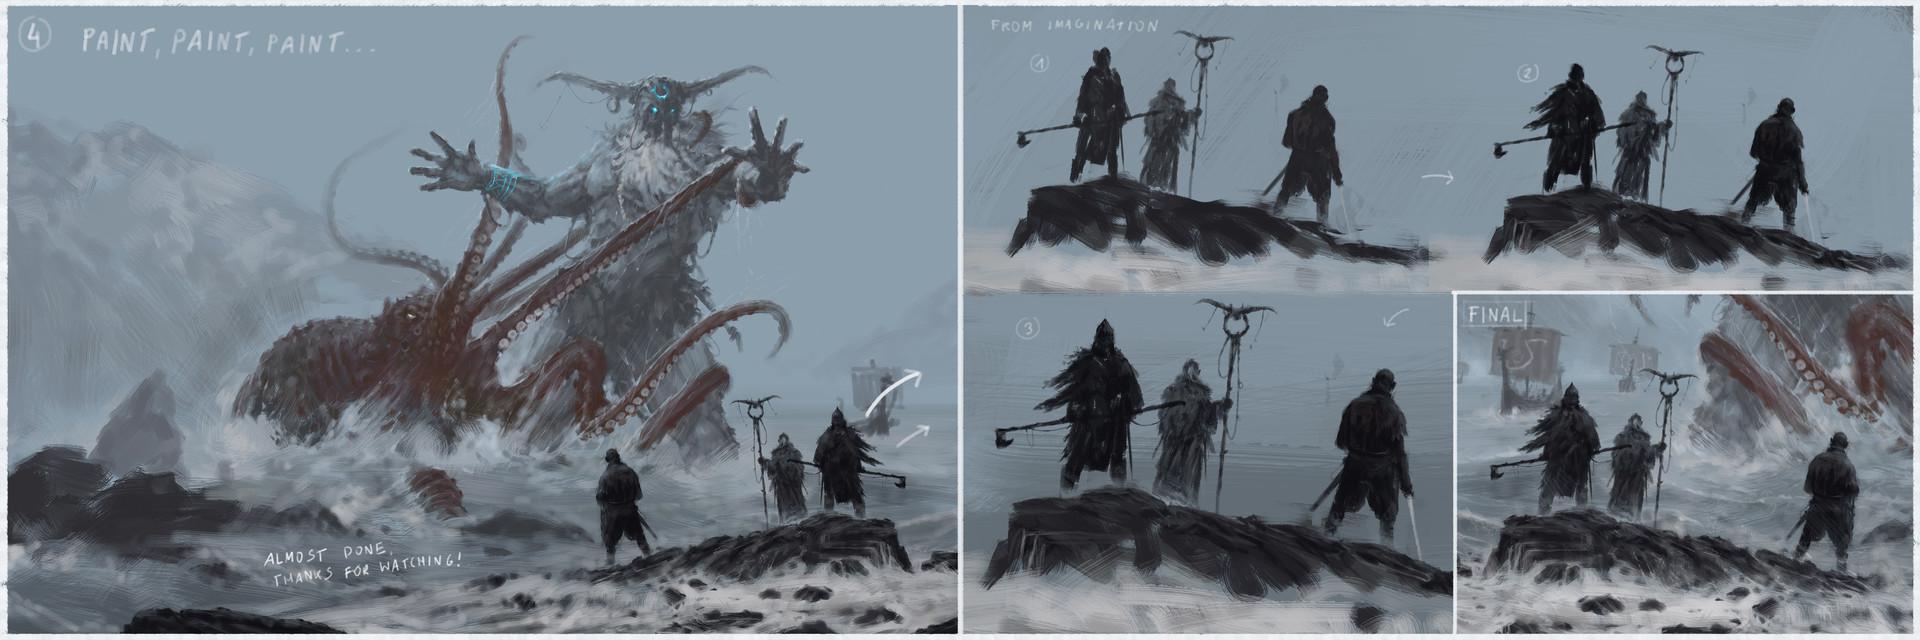 Jakub rozalski ymaar fighting kraken process03